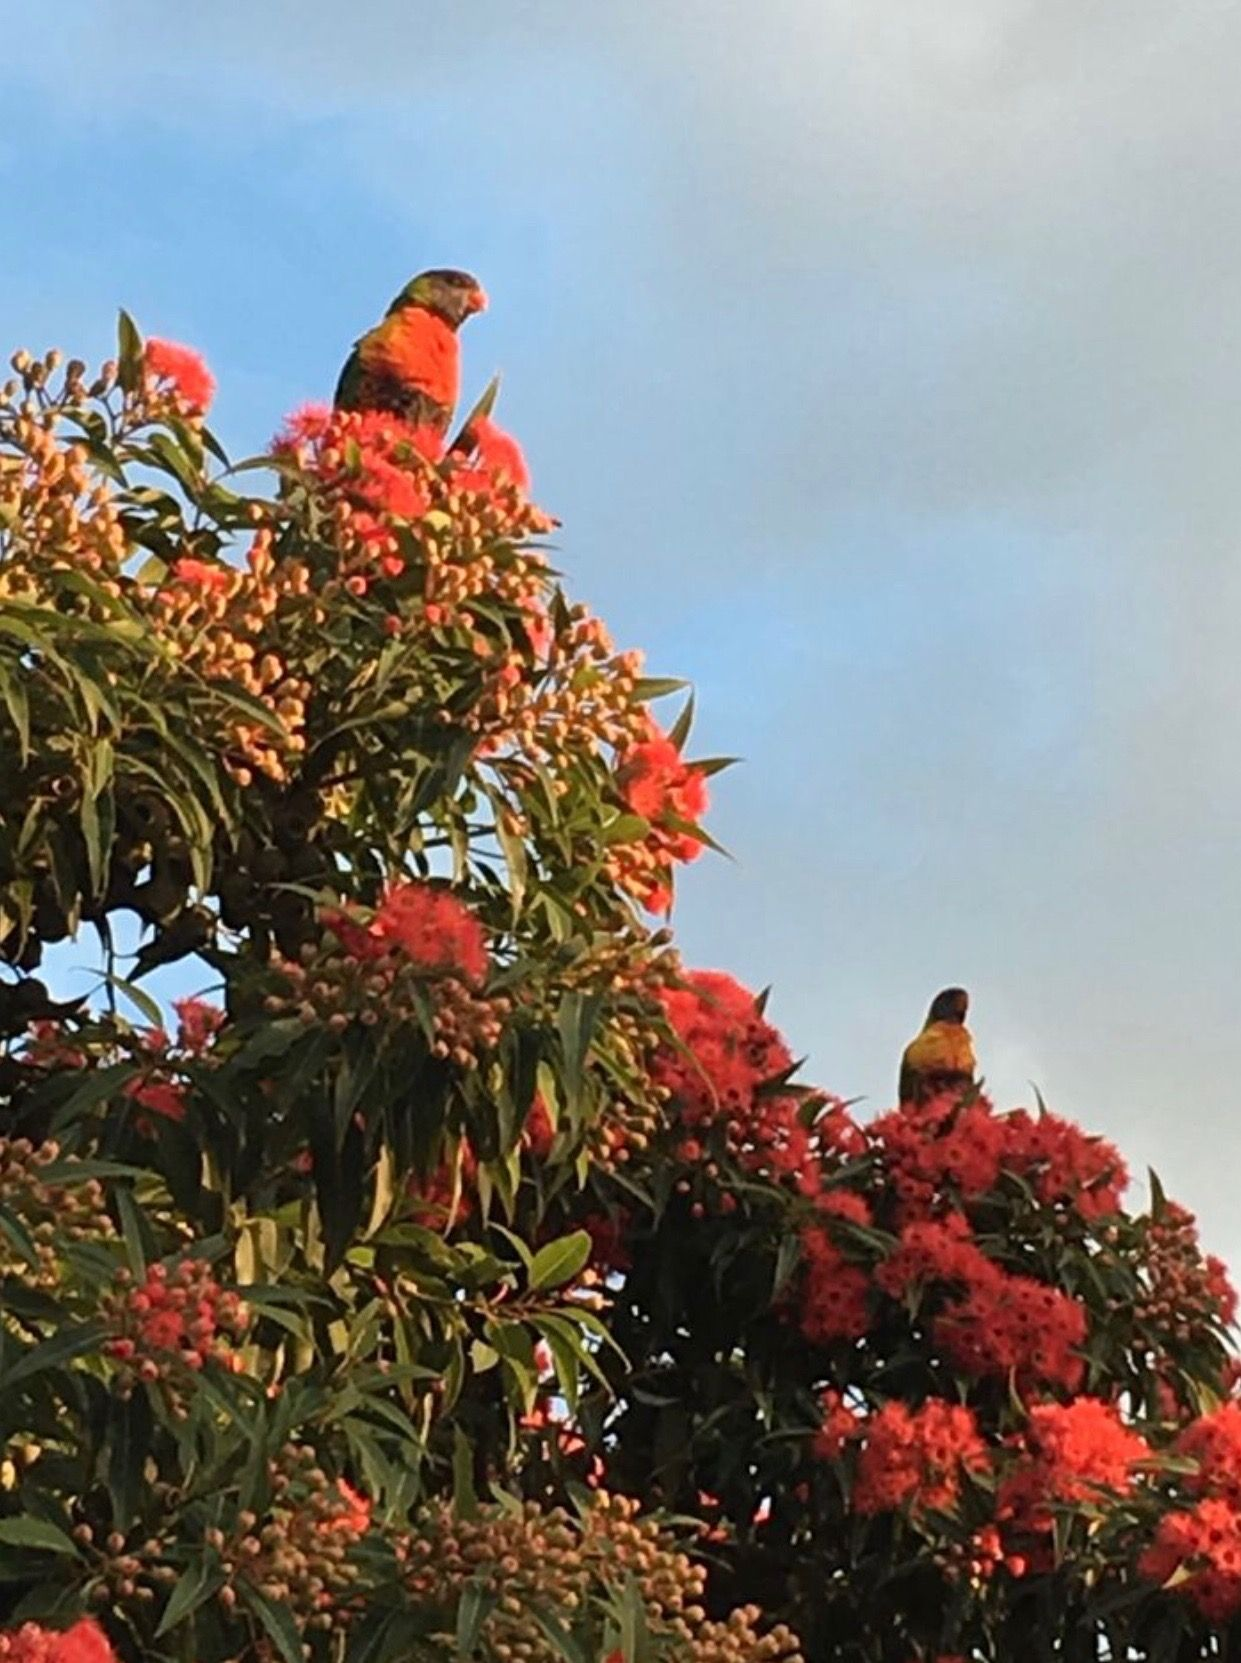 Our Gondwanan Gum Trees Australian Geographic Australian Photography Christmas Ornaments Gum